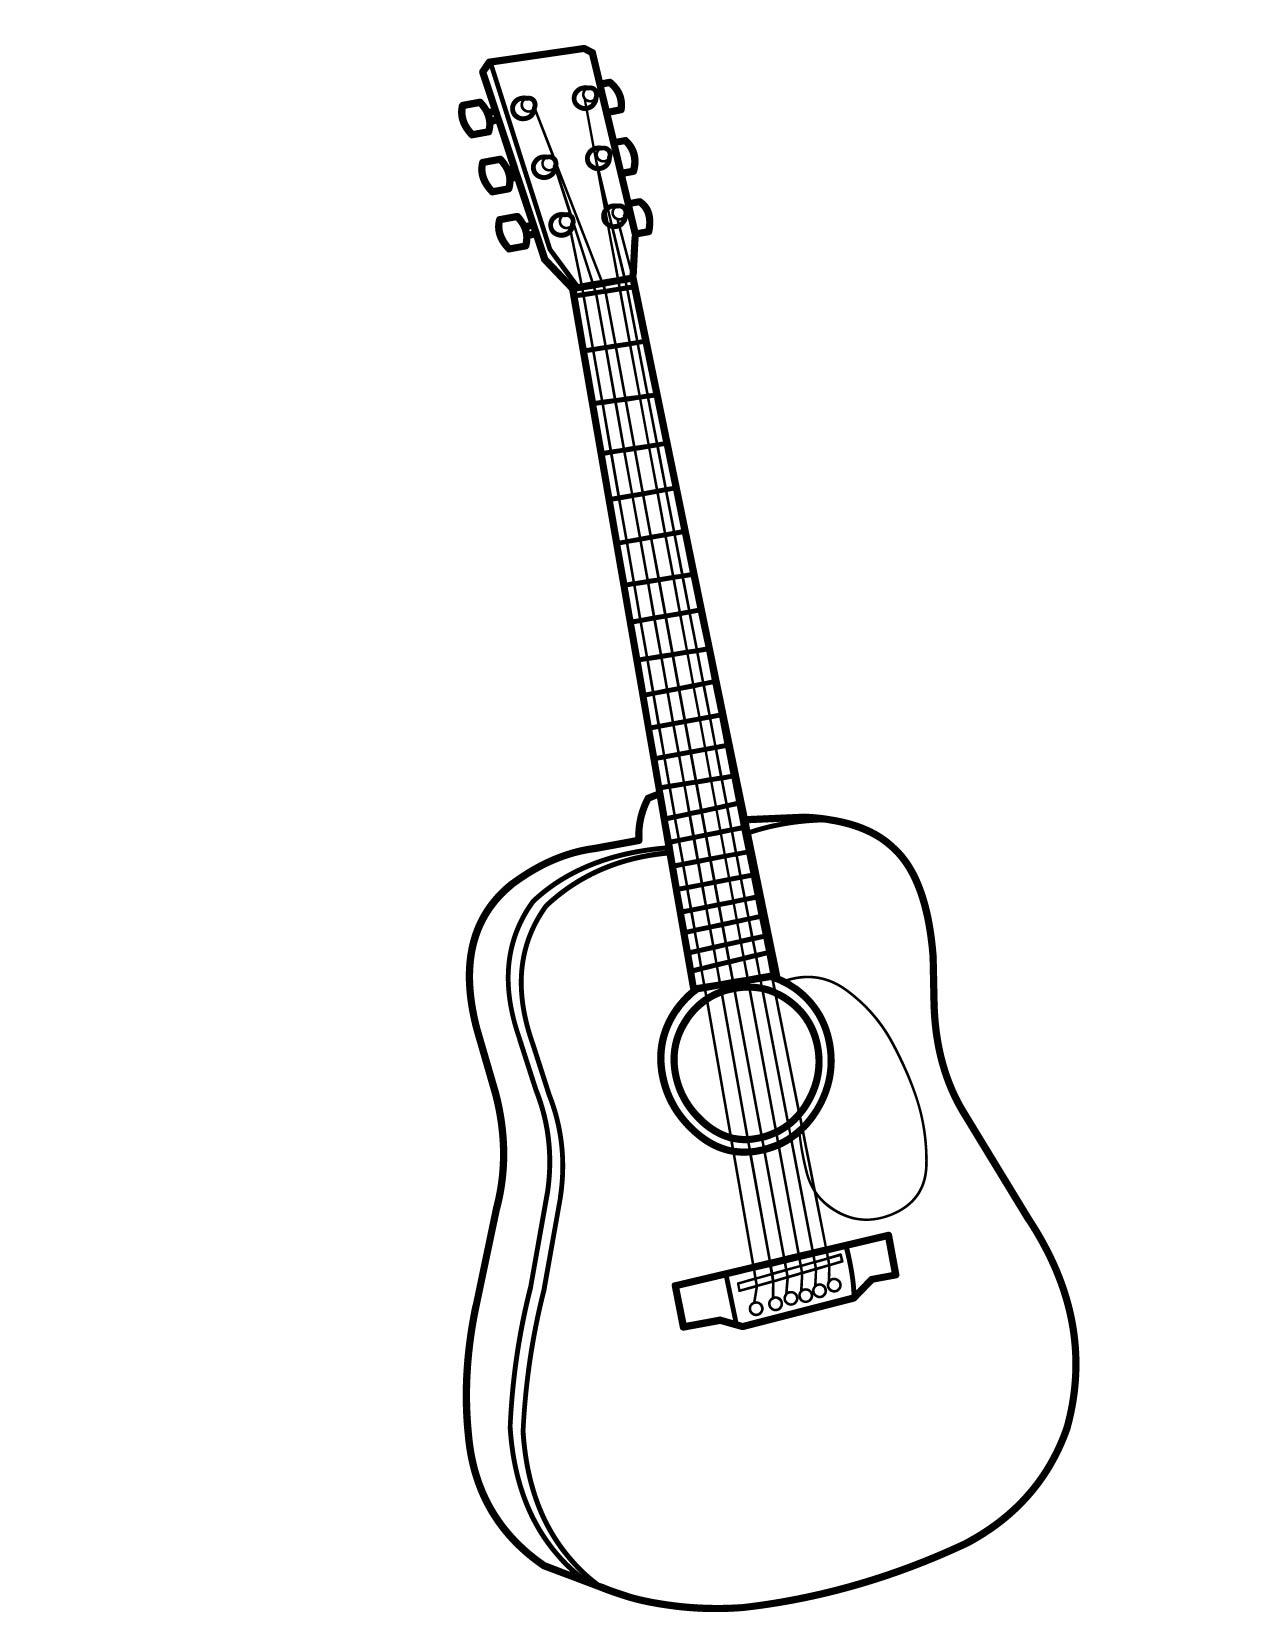 Гитары раскраски